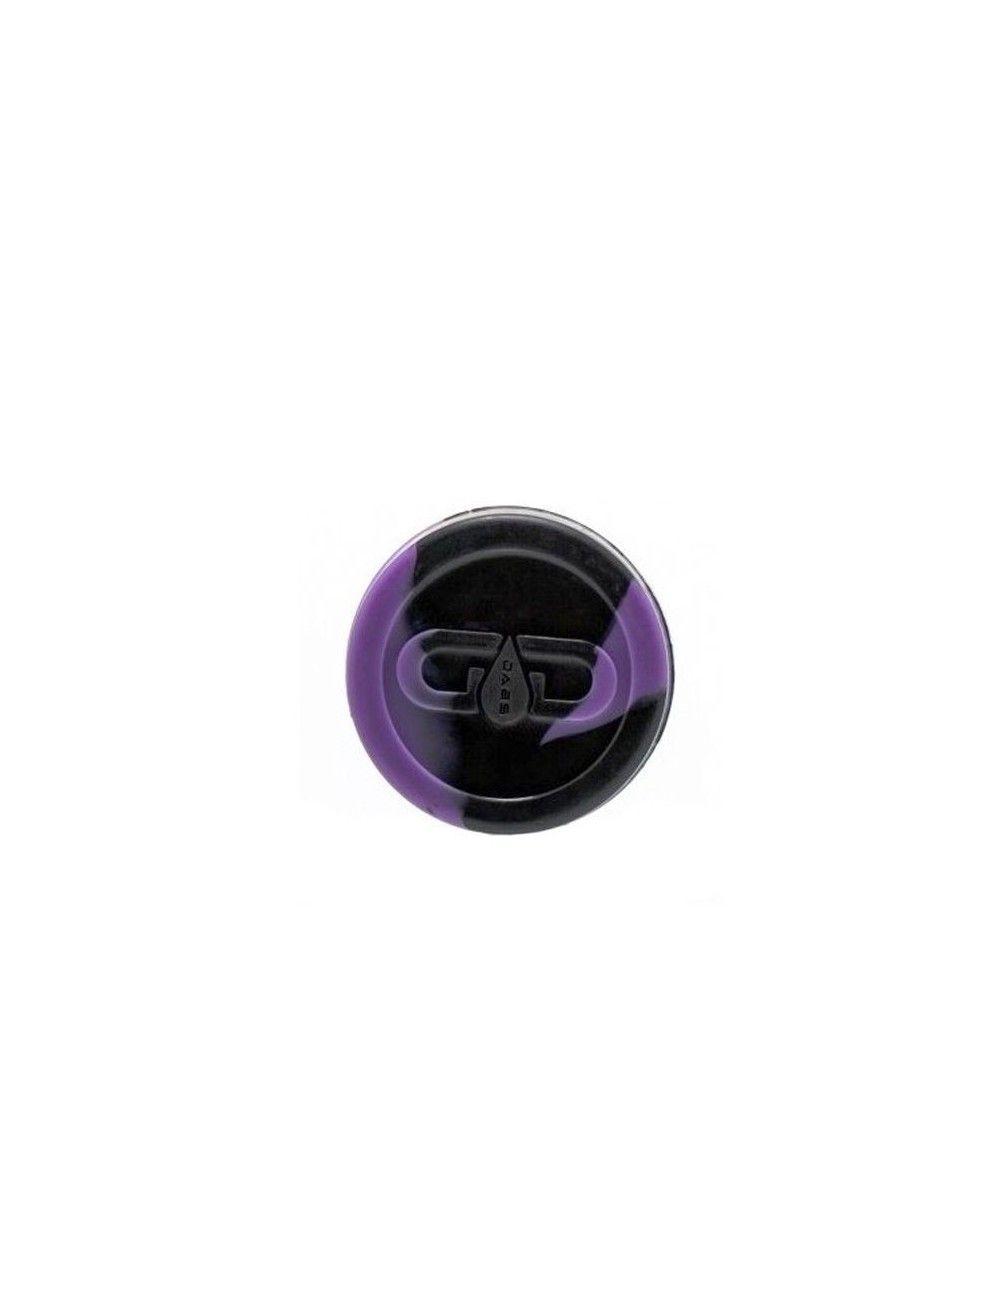 GG Dabs Silicone Jar Black Purple